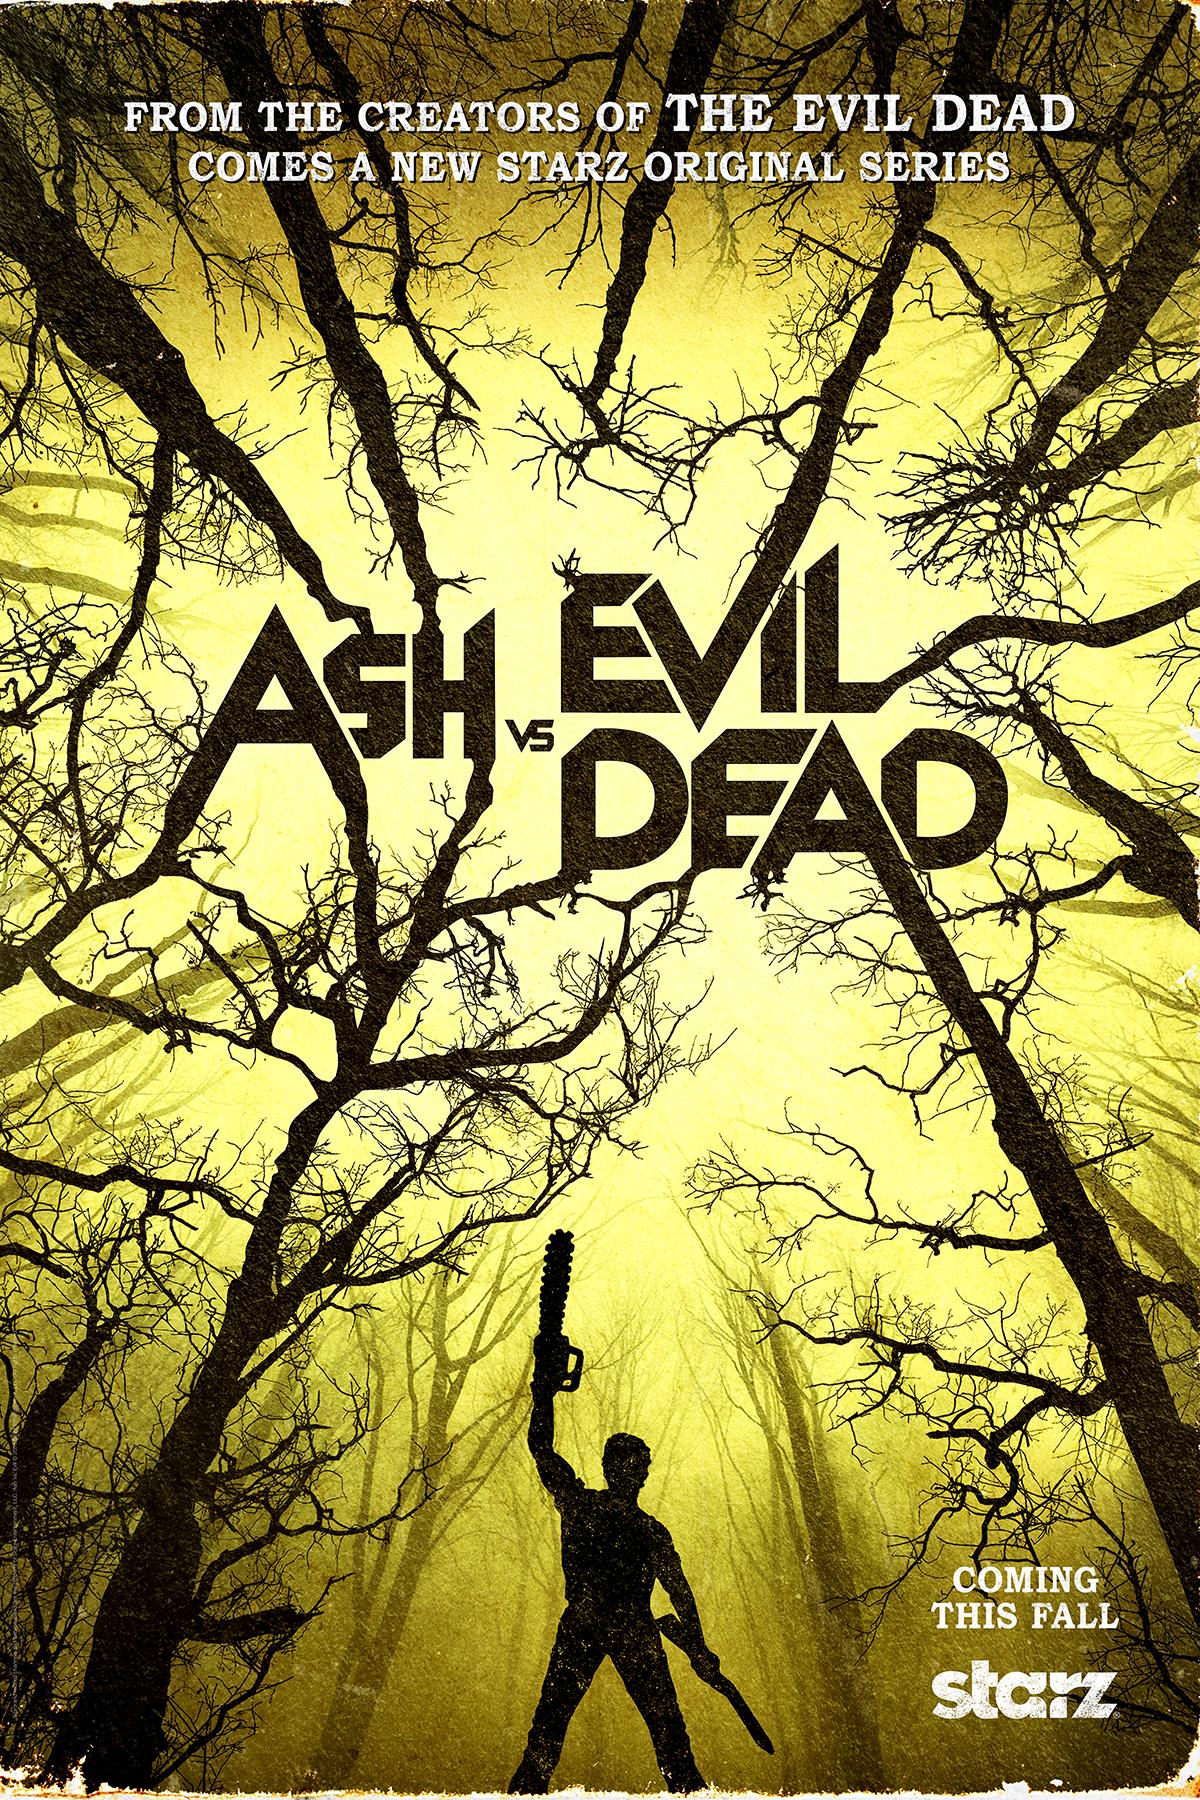 Teaser Trailer And Poster For Ash Vs Evil Dead Released Reel